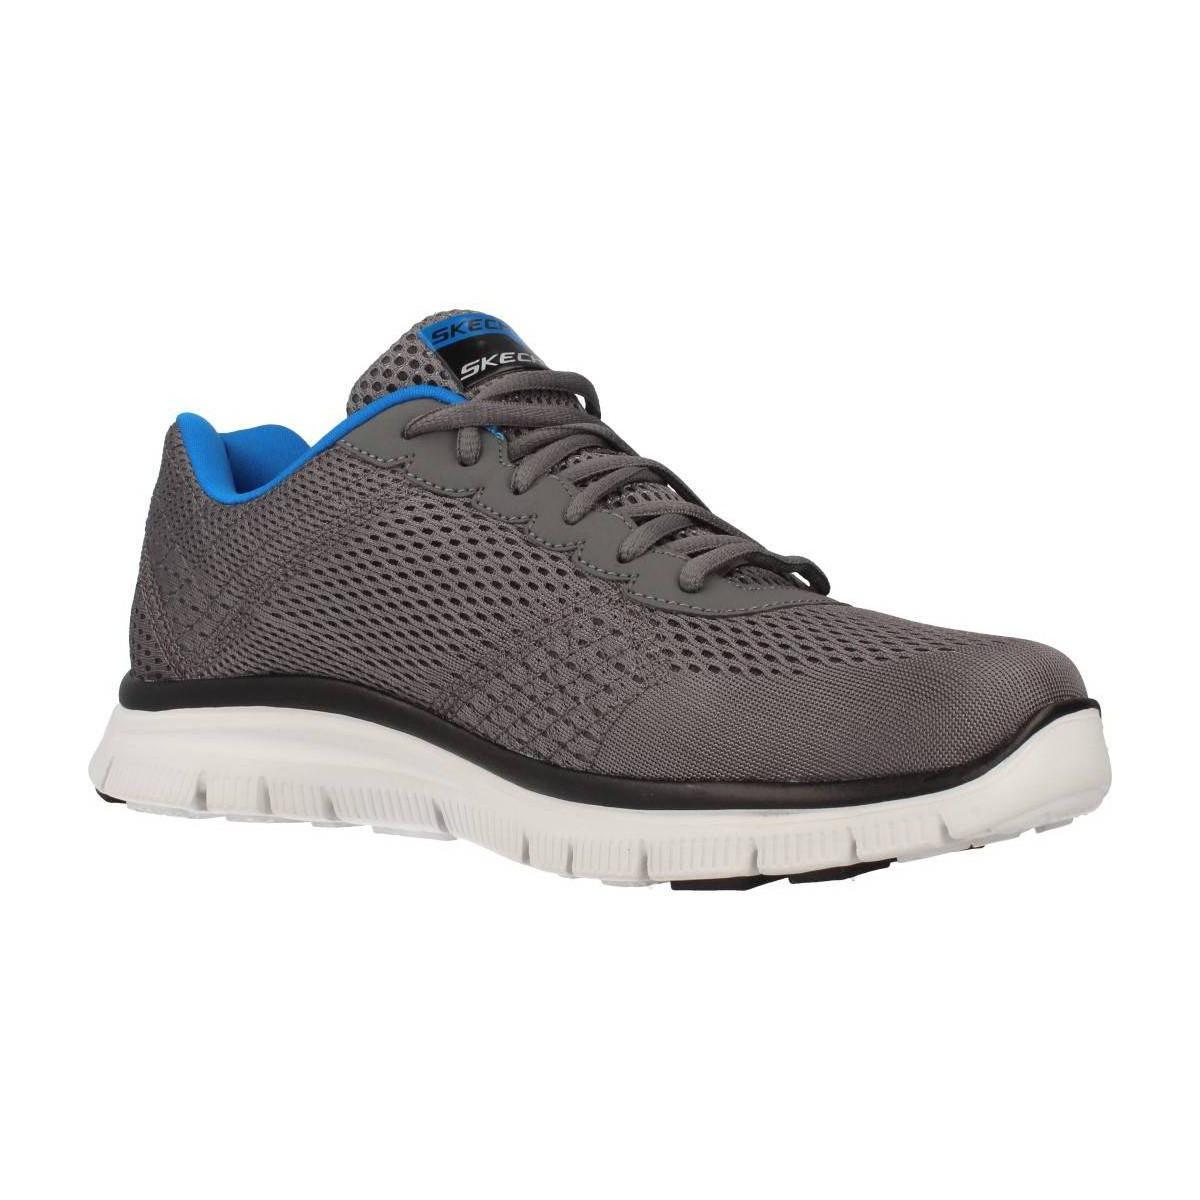 Chaussure running homme sport 2000